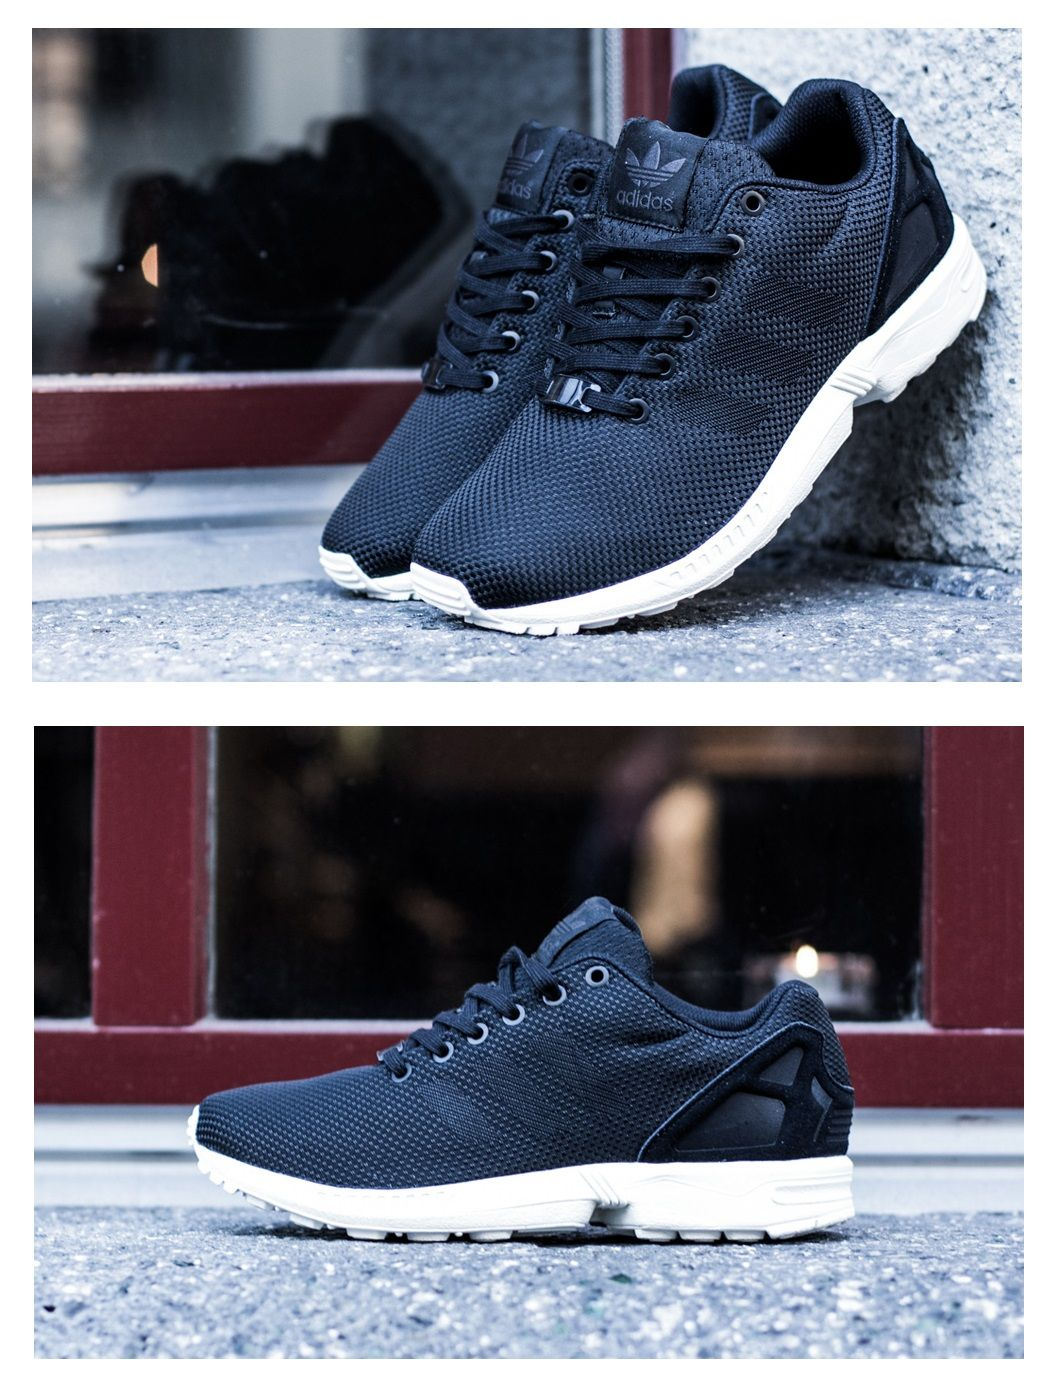 adidas zx flux weave black elements sneakers adidas. Black Bedroom Furniture Sets. Home Design Ideas